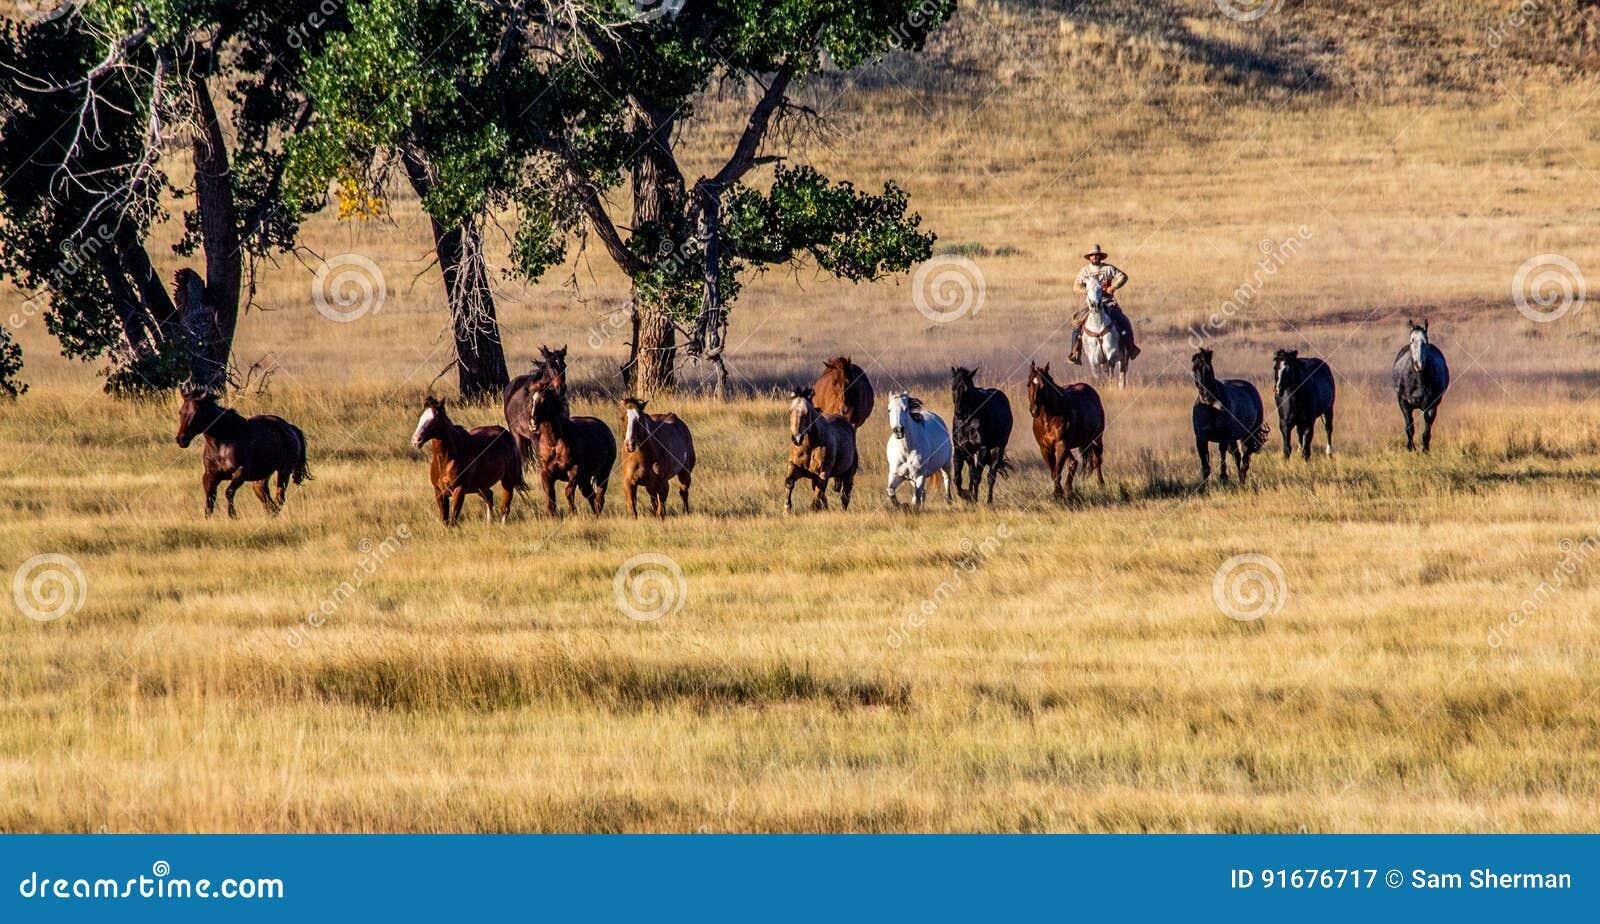 Cowboy Wrangling a Herd of Horses